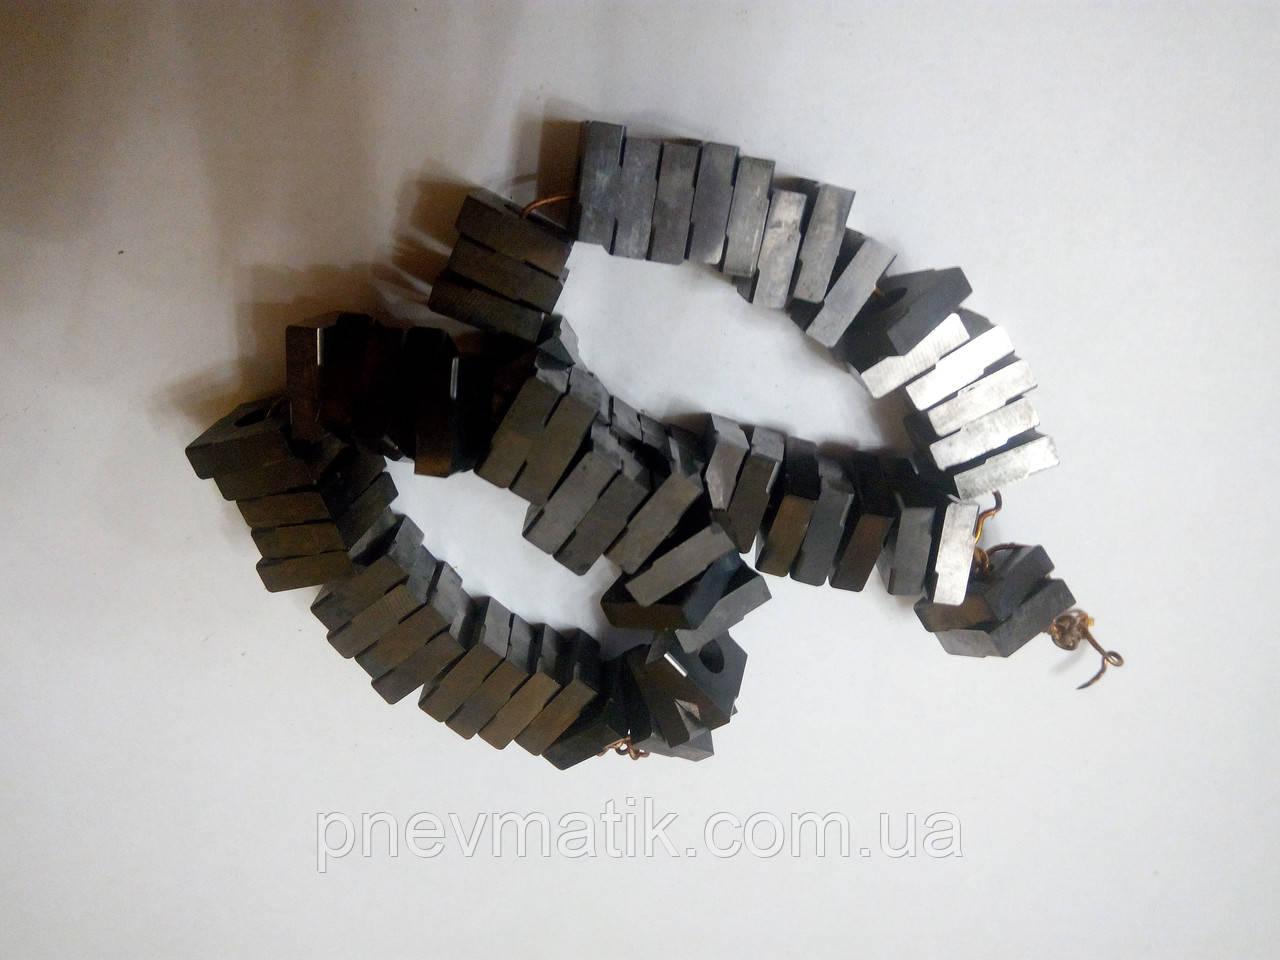 Твердосплавная пластина КНТ-16, с фасками на углах 03113-120408